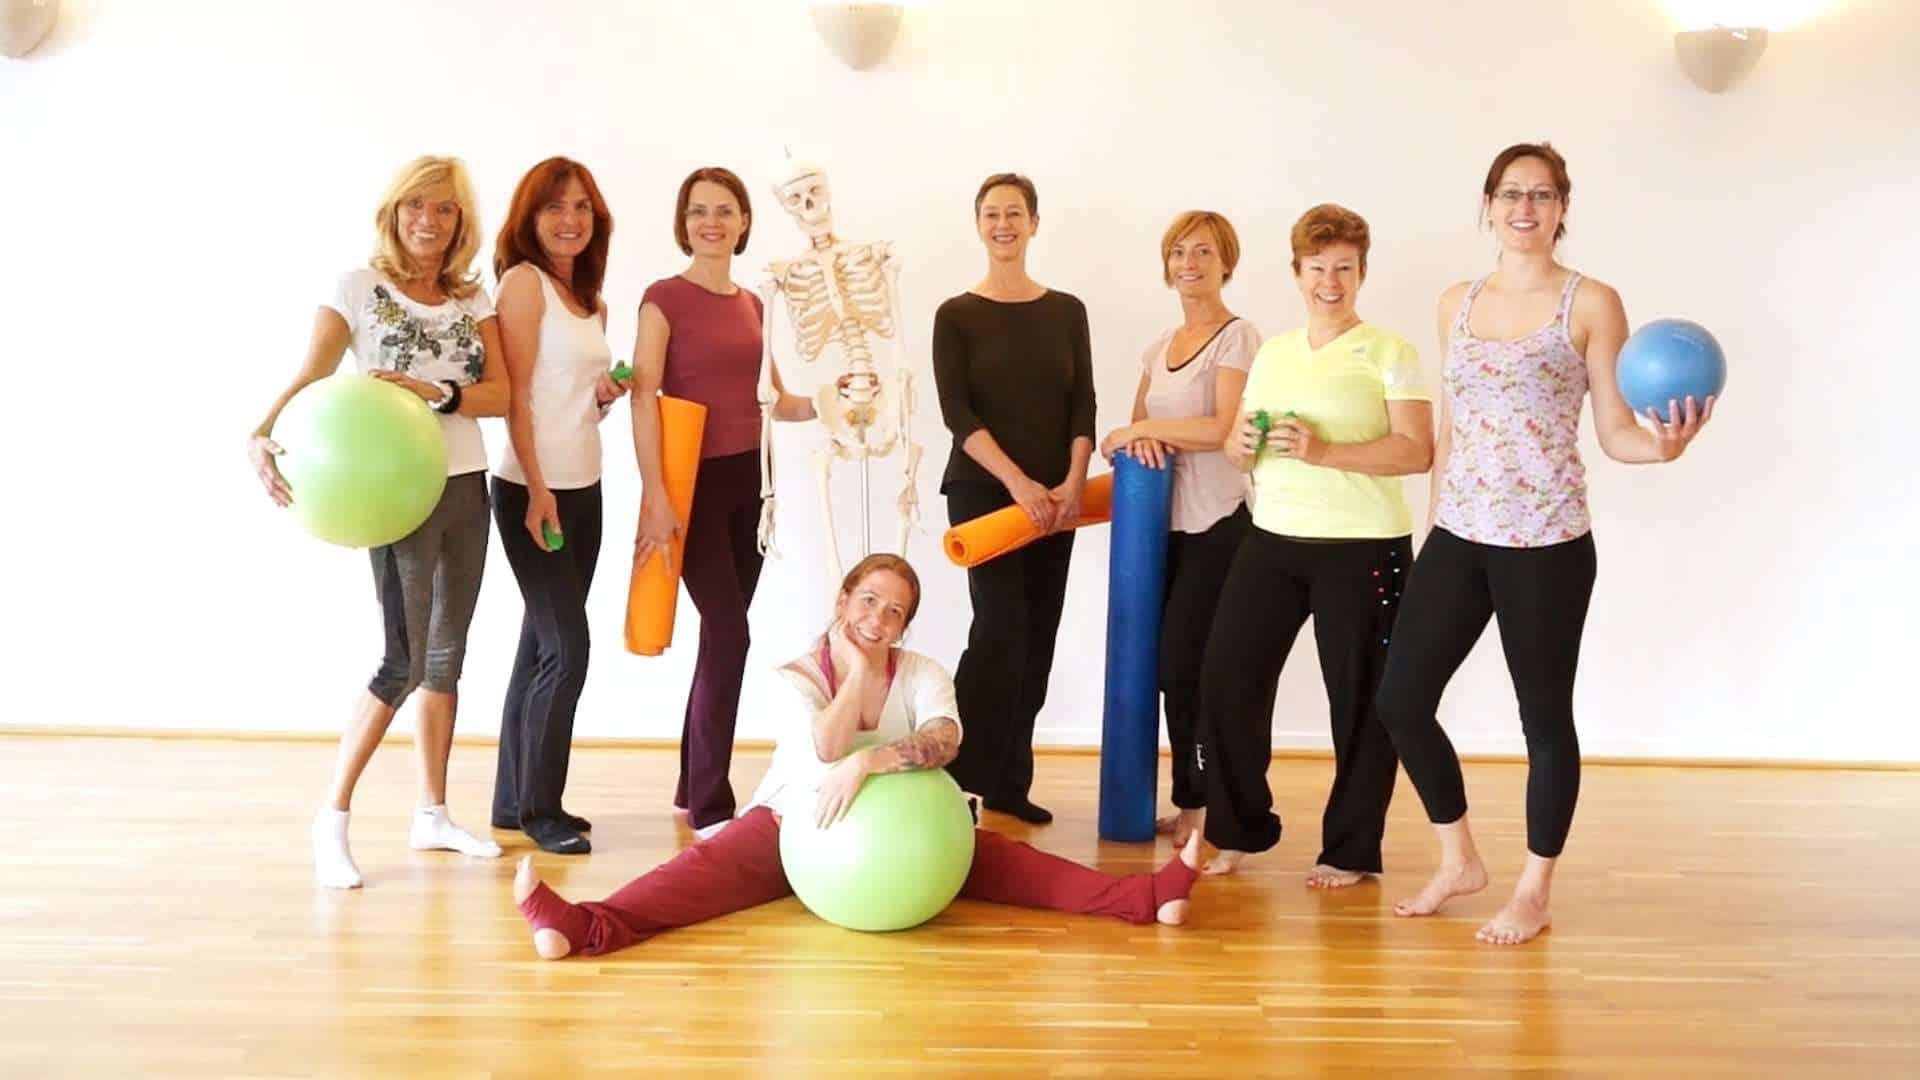 Abschluss der Tripada® Pilatestrainer Ausbildung 2016